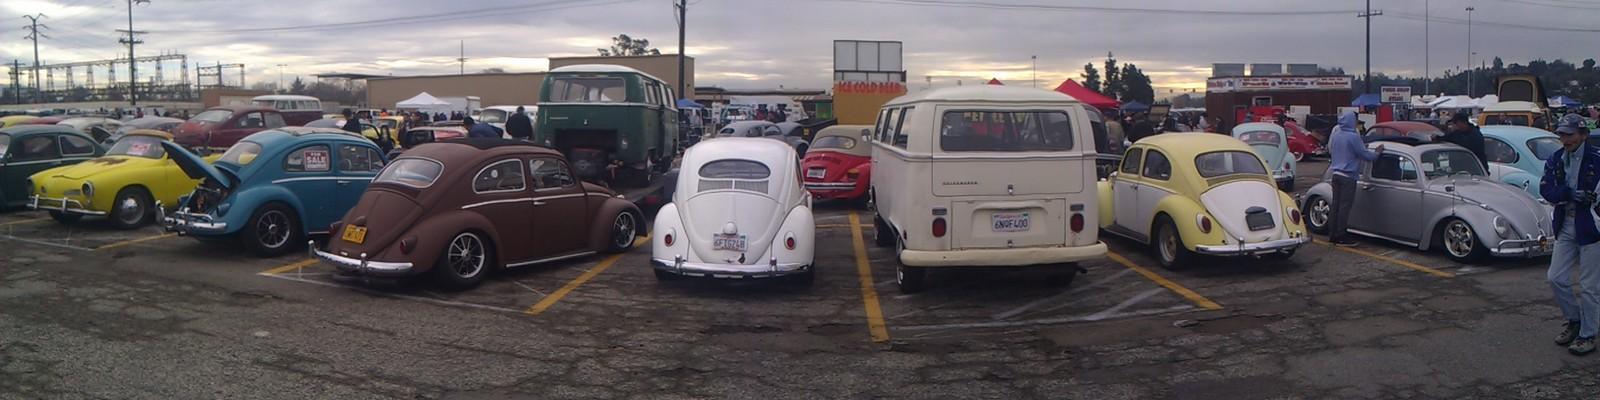 Pamona Classic car show 2012